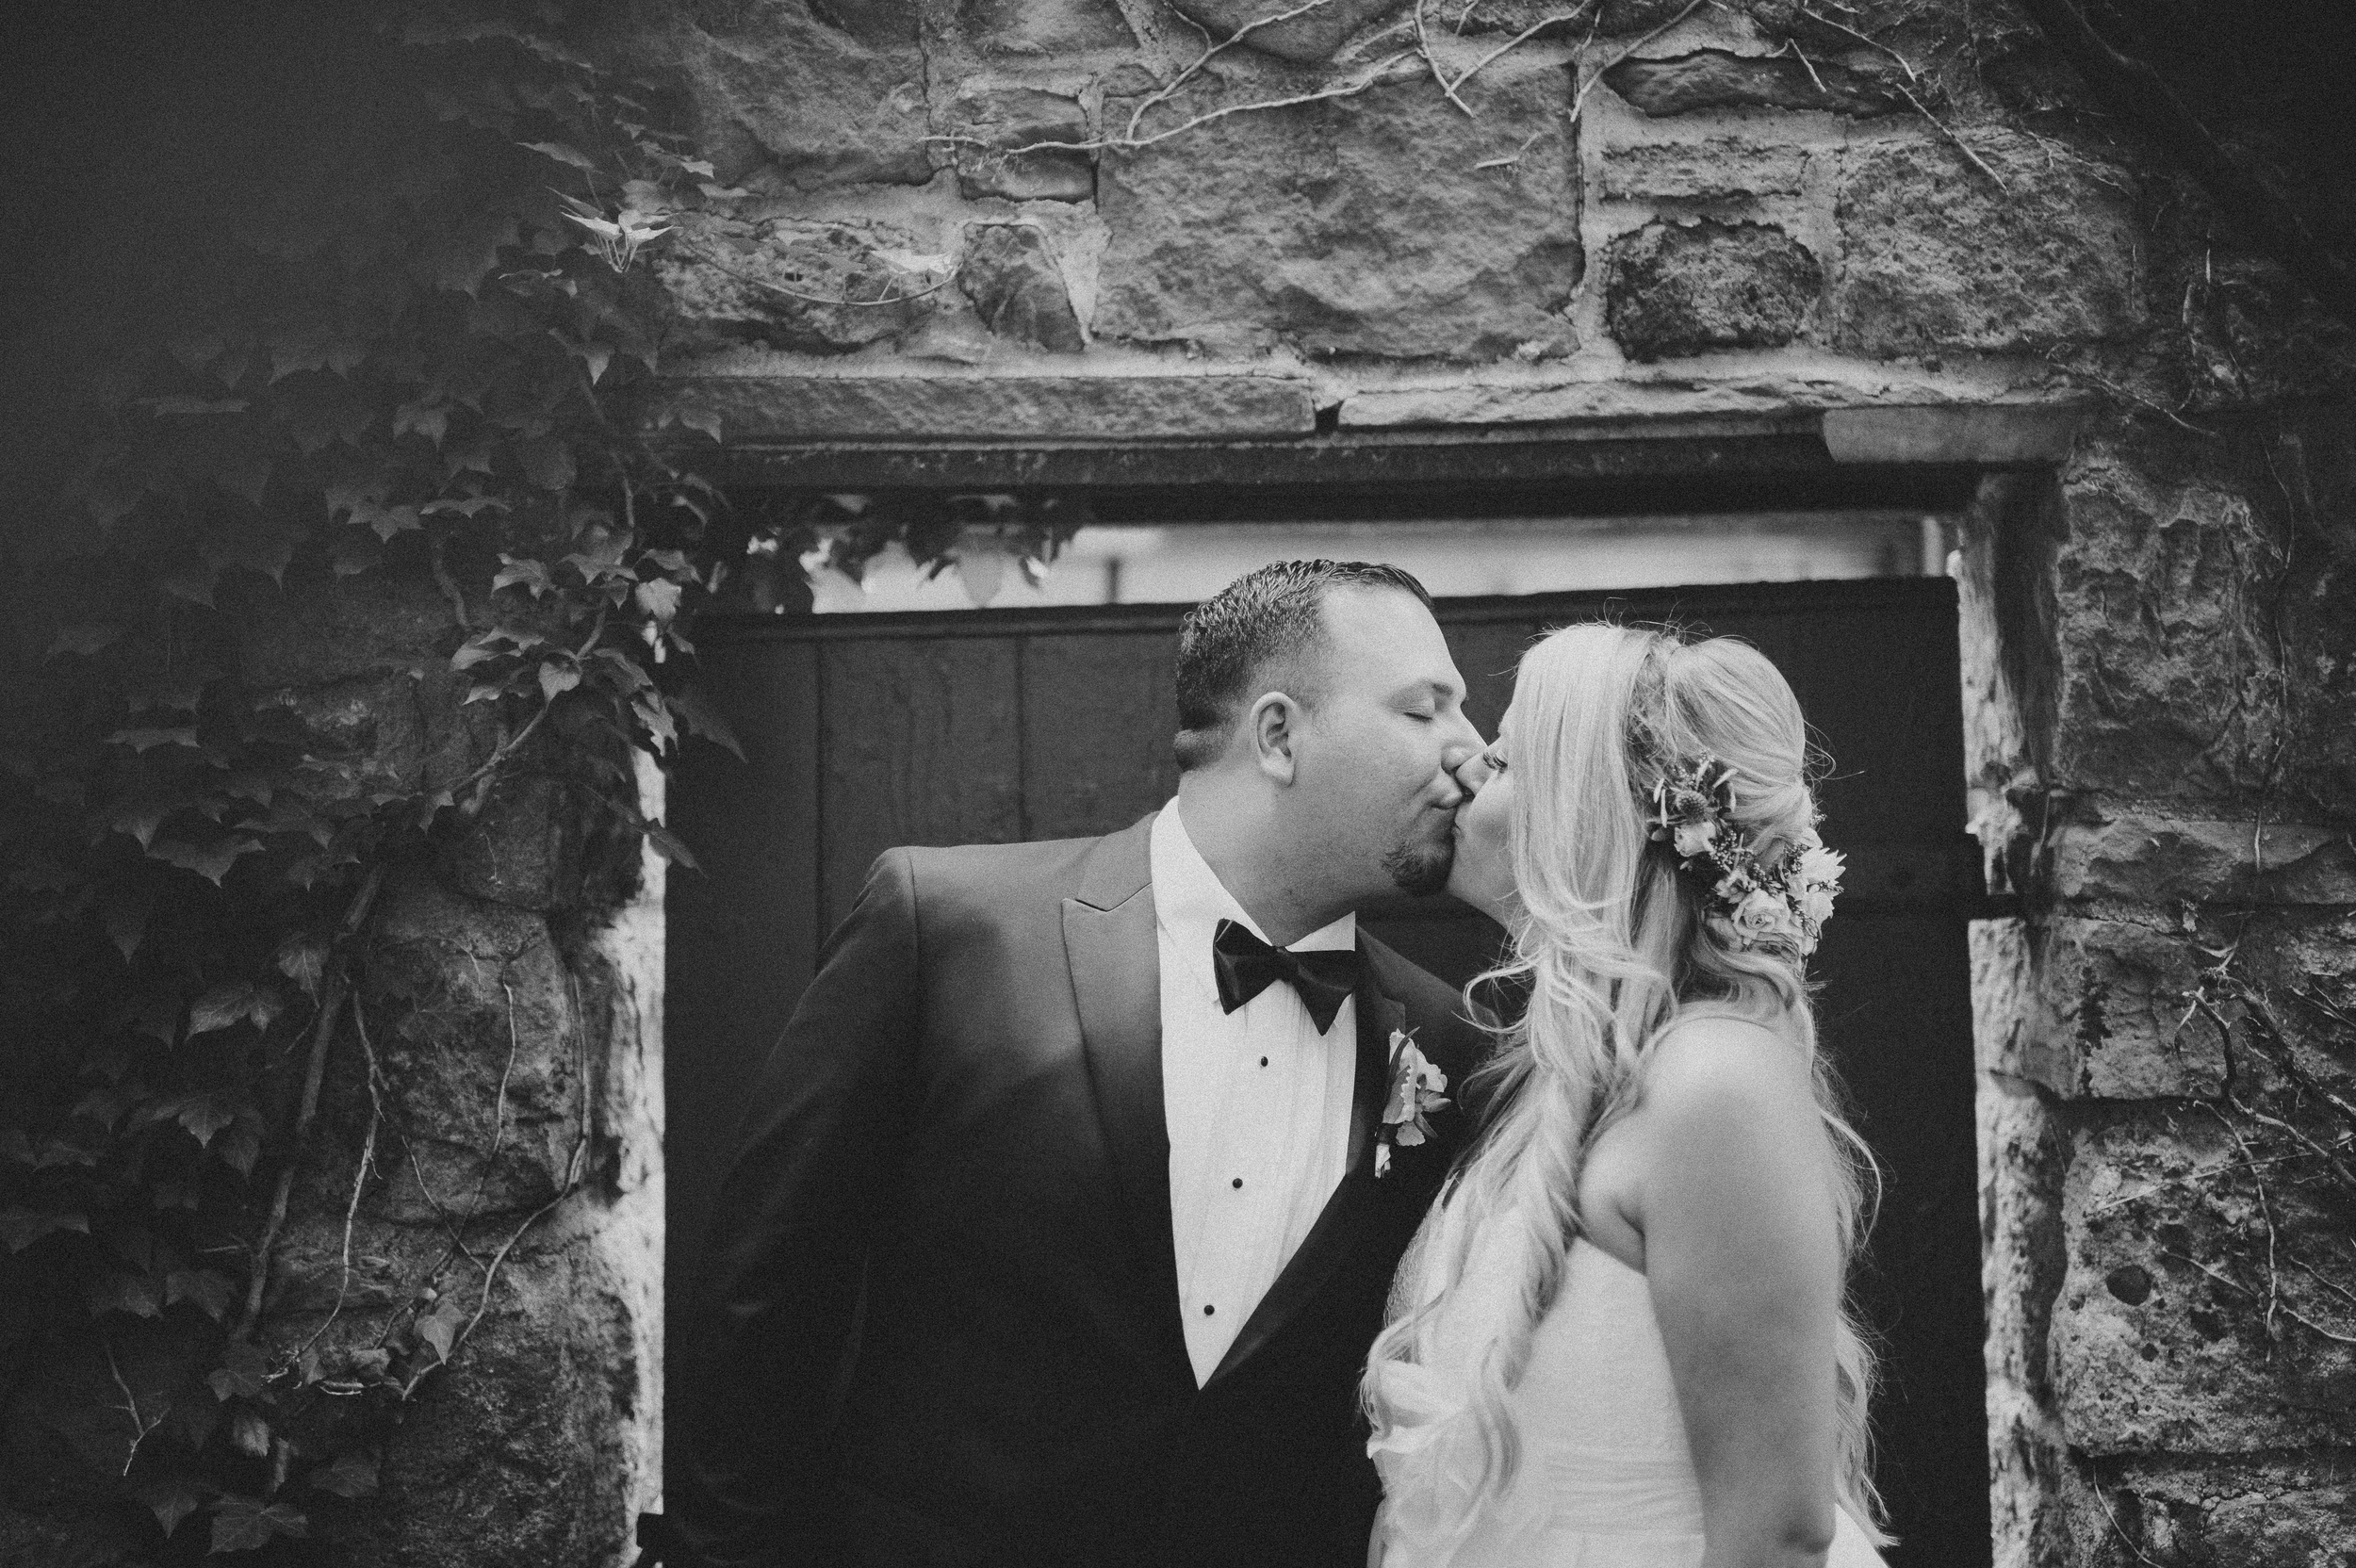 holly-hedge-estate-wedding-photographer-pat-robinson-photography-41.jpg